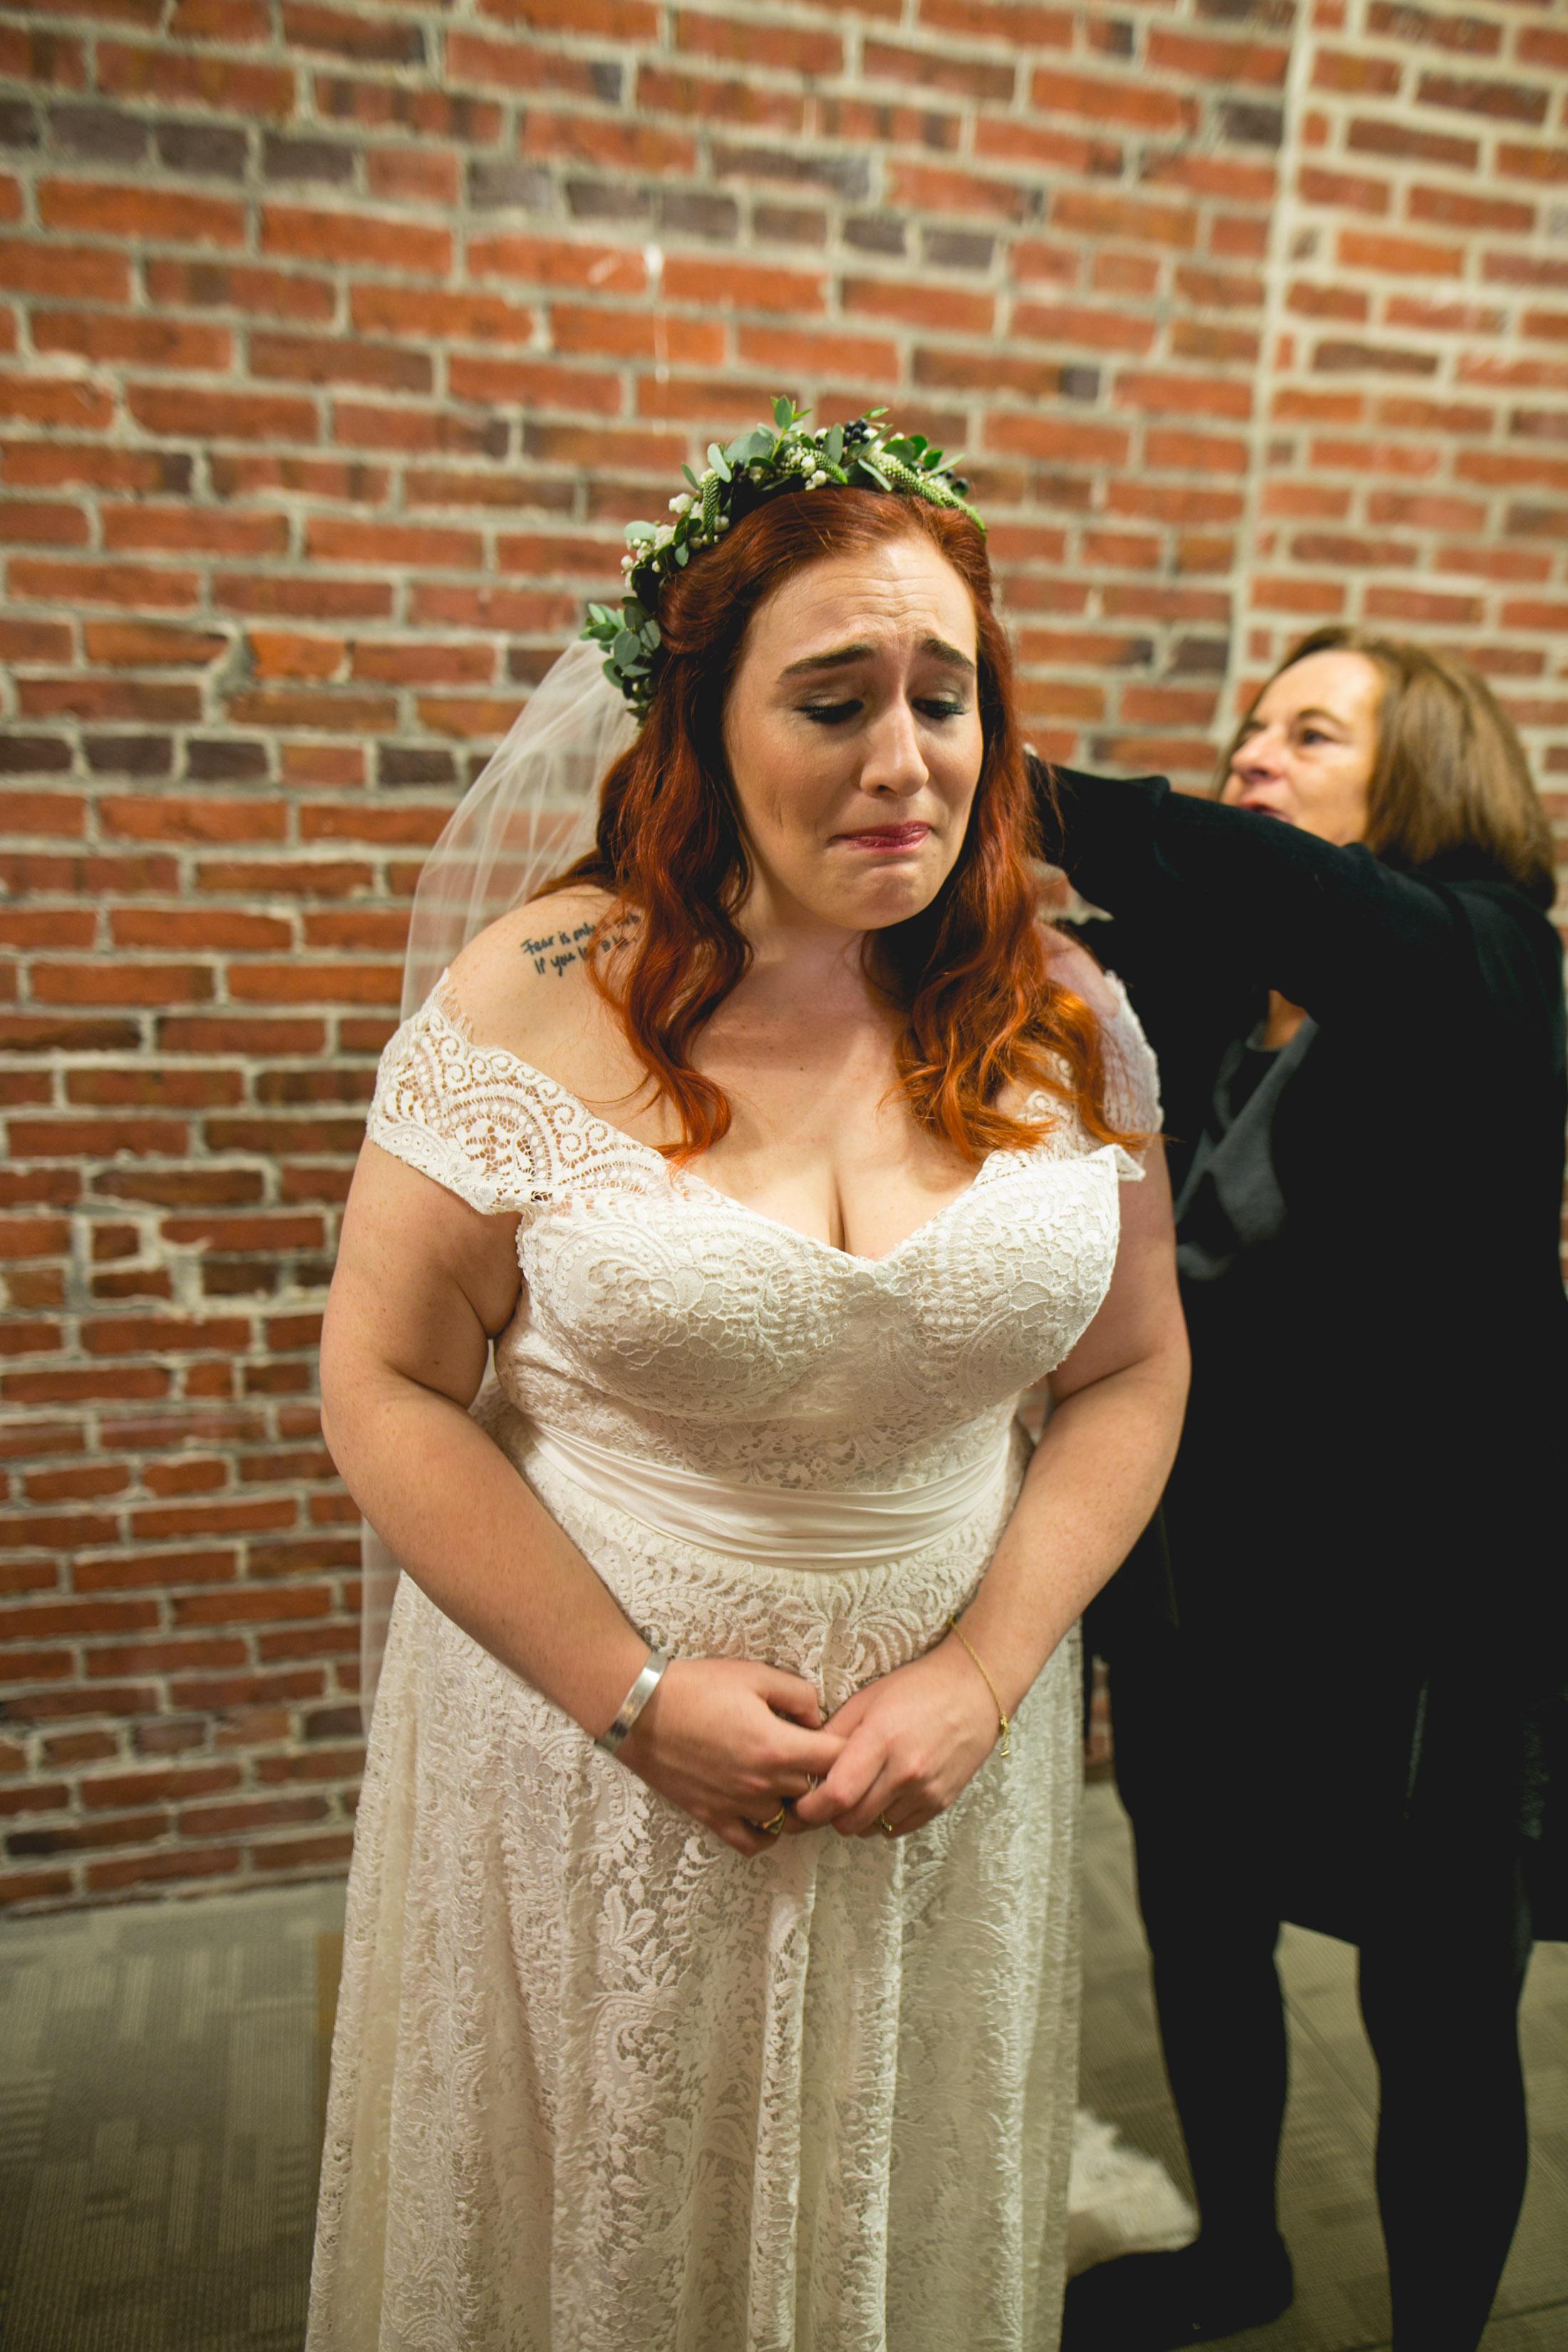 Patriotic LGBTQ Winter Styled Wedding 11